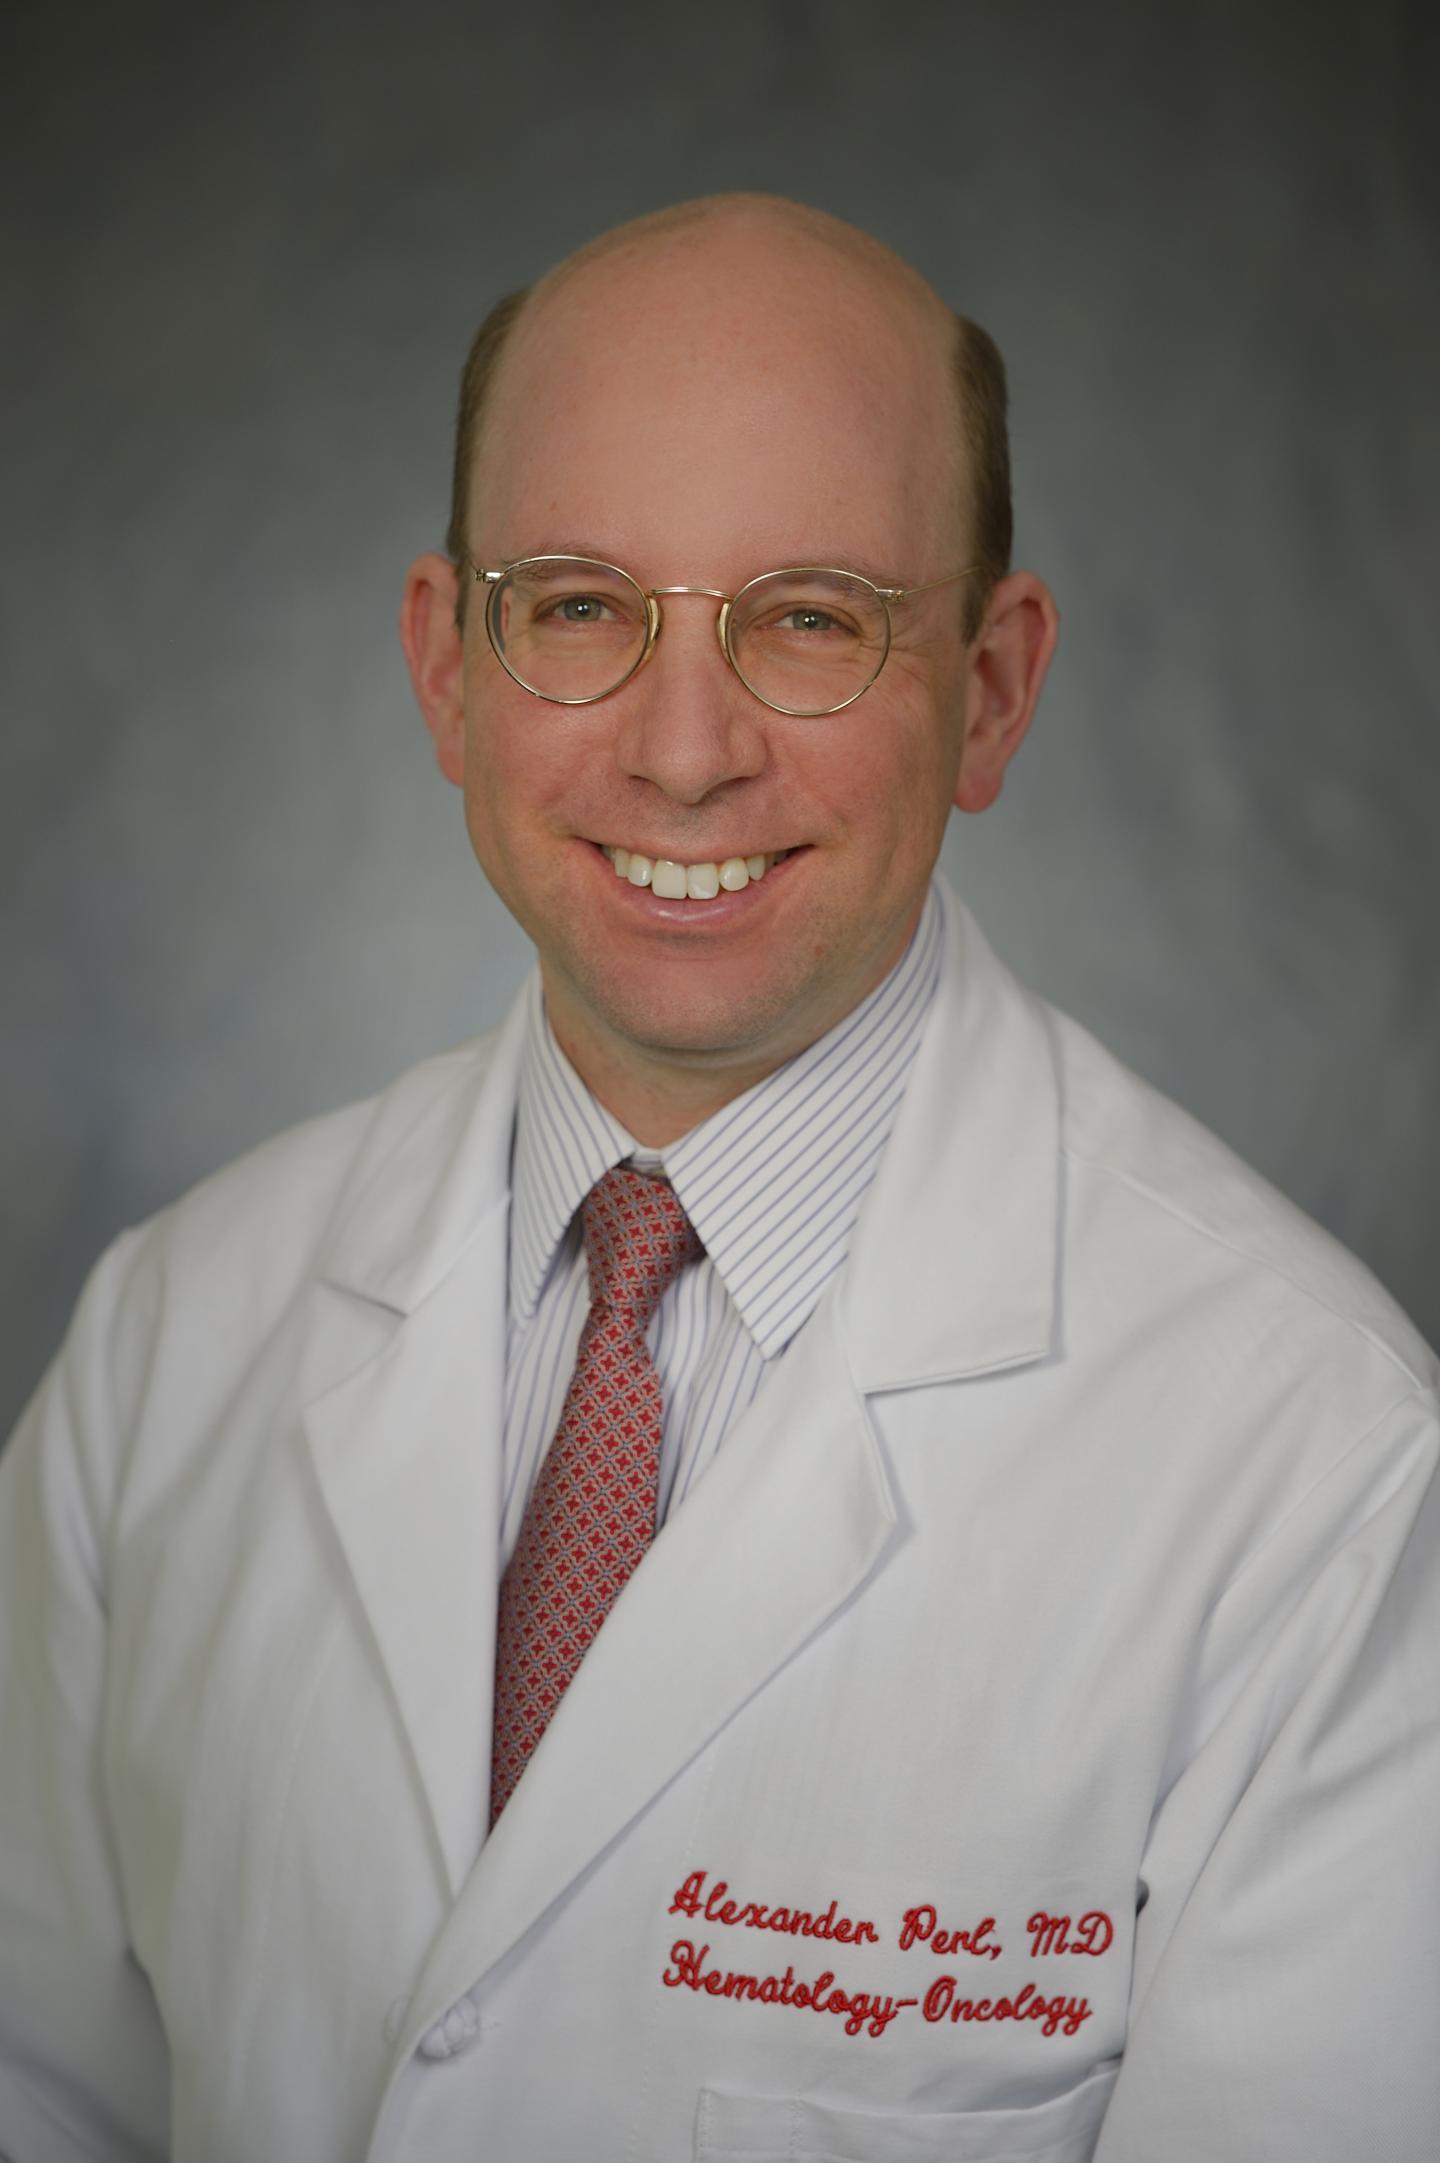 Alexander Perl, University of Pennsylvania School of Medicine